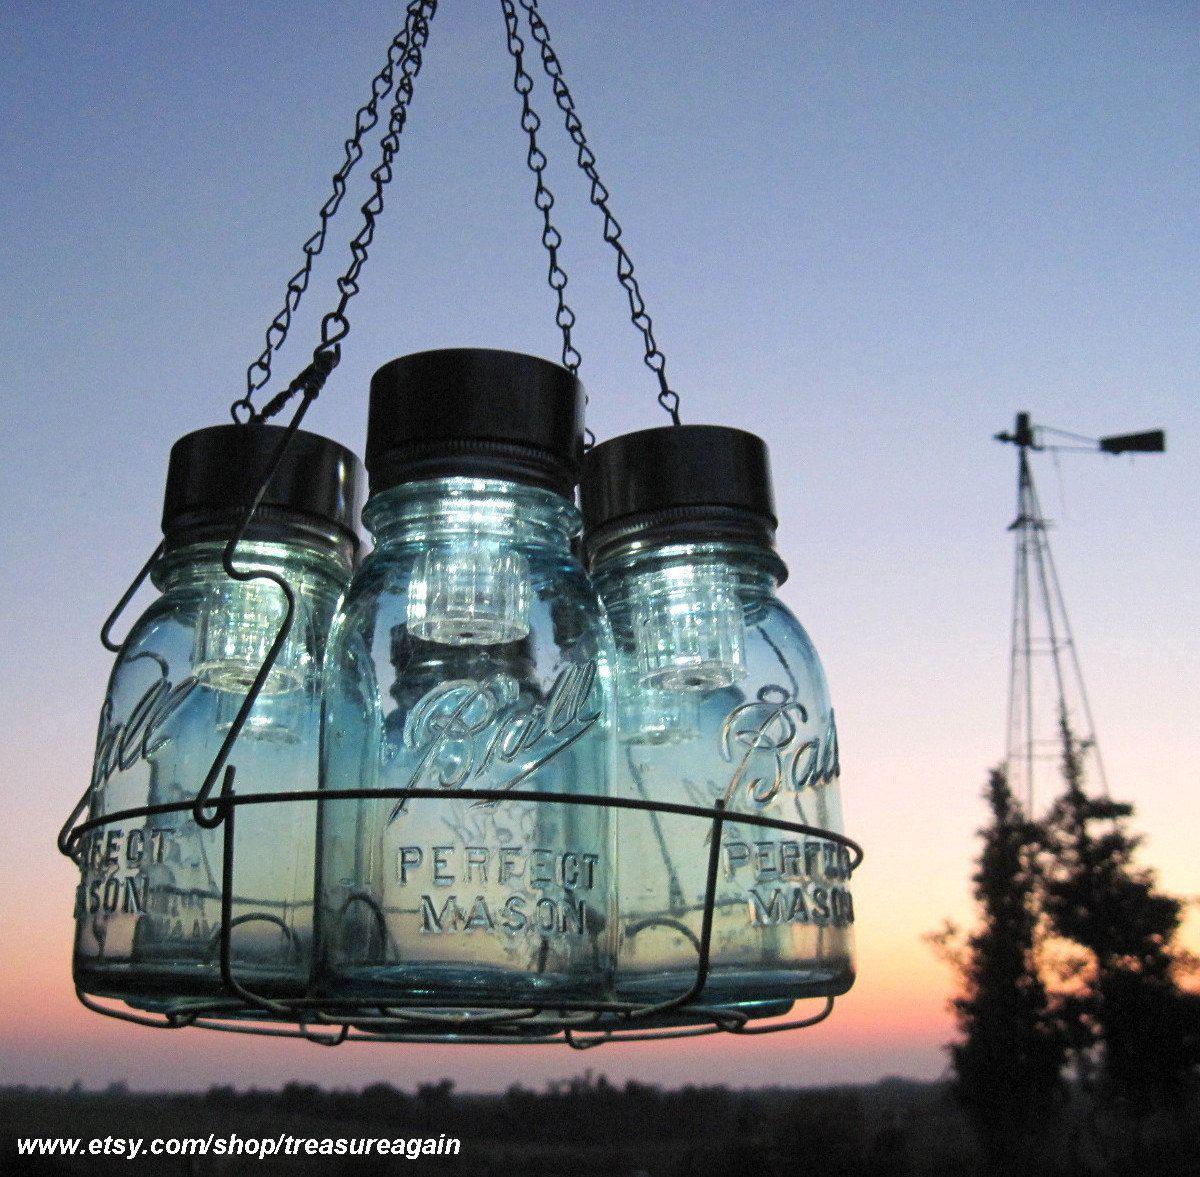 Solar Mason Jar Chandelier, Mason Jar Hanging Chandelier, Candles Garden Country Barn Rustic Wedding Original Mason Jar Solar Light Design #kronleuchterauseinmachgläsern